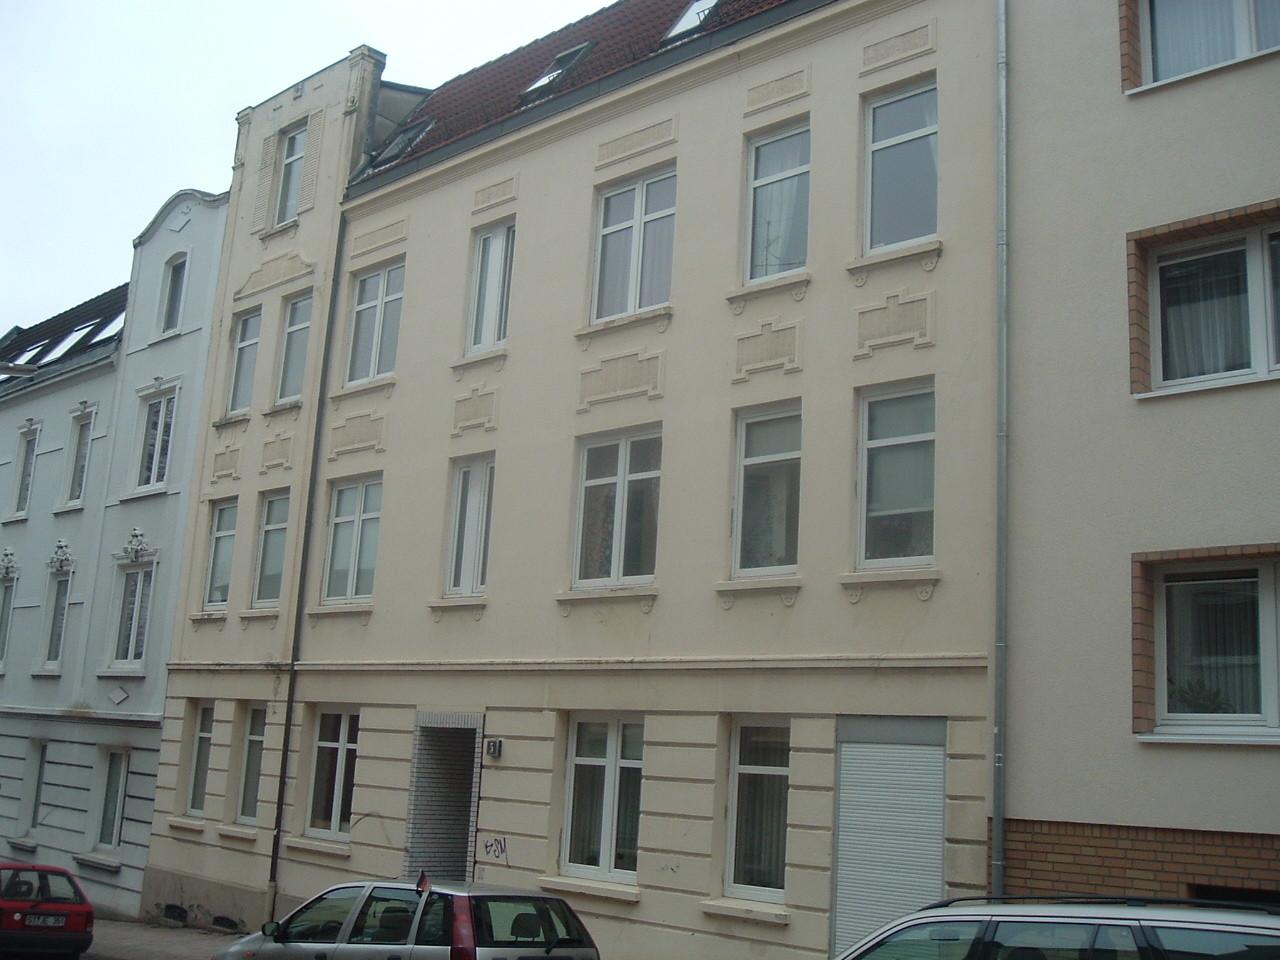 Fassadenbeschichtung vorher 1